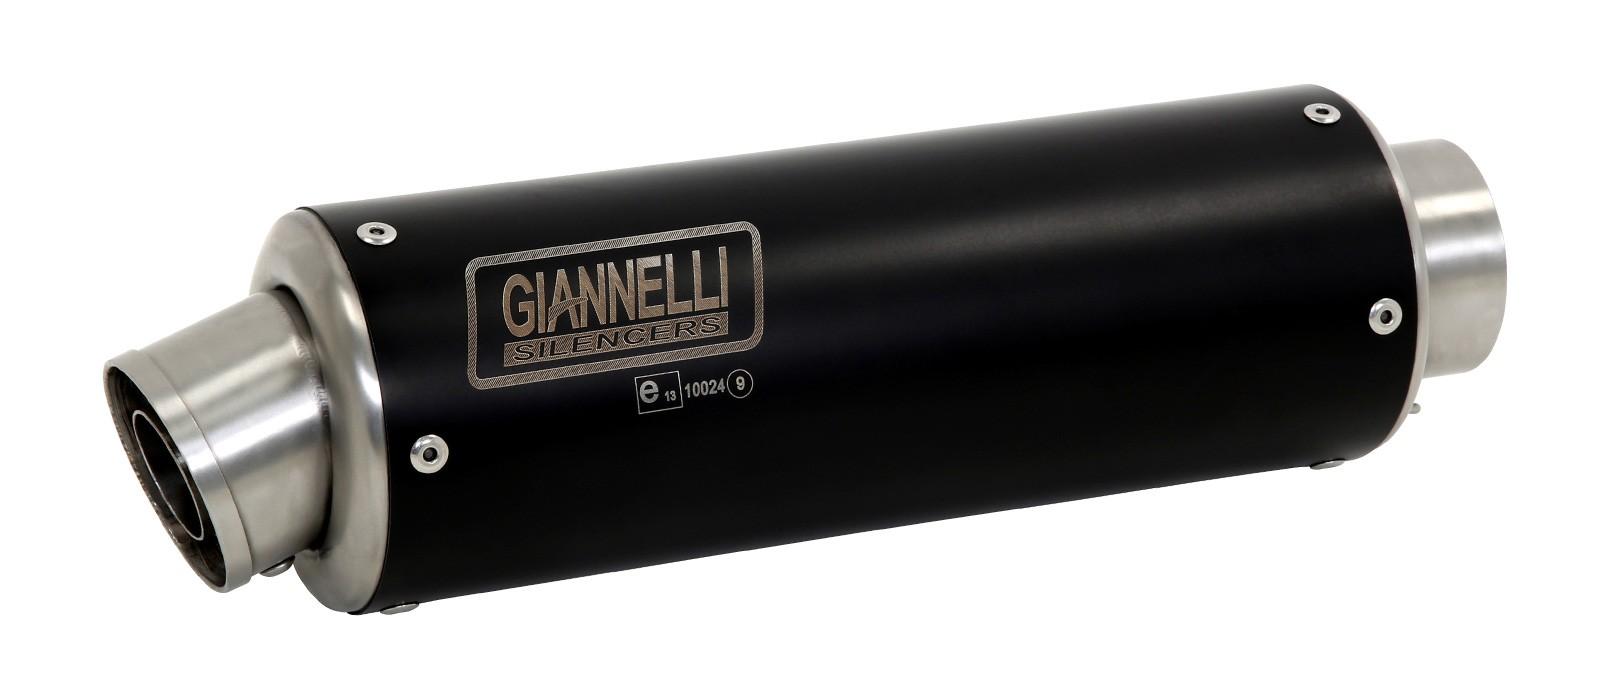 ESCAPES GIANNELLI YAMAHA - Slip-on nicrom X-PRO Yamaha YZF 1000 R1 Giannelli 73552XPI -